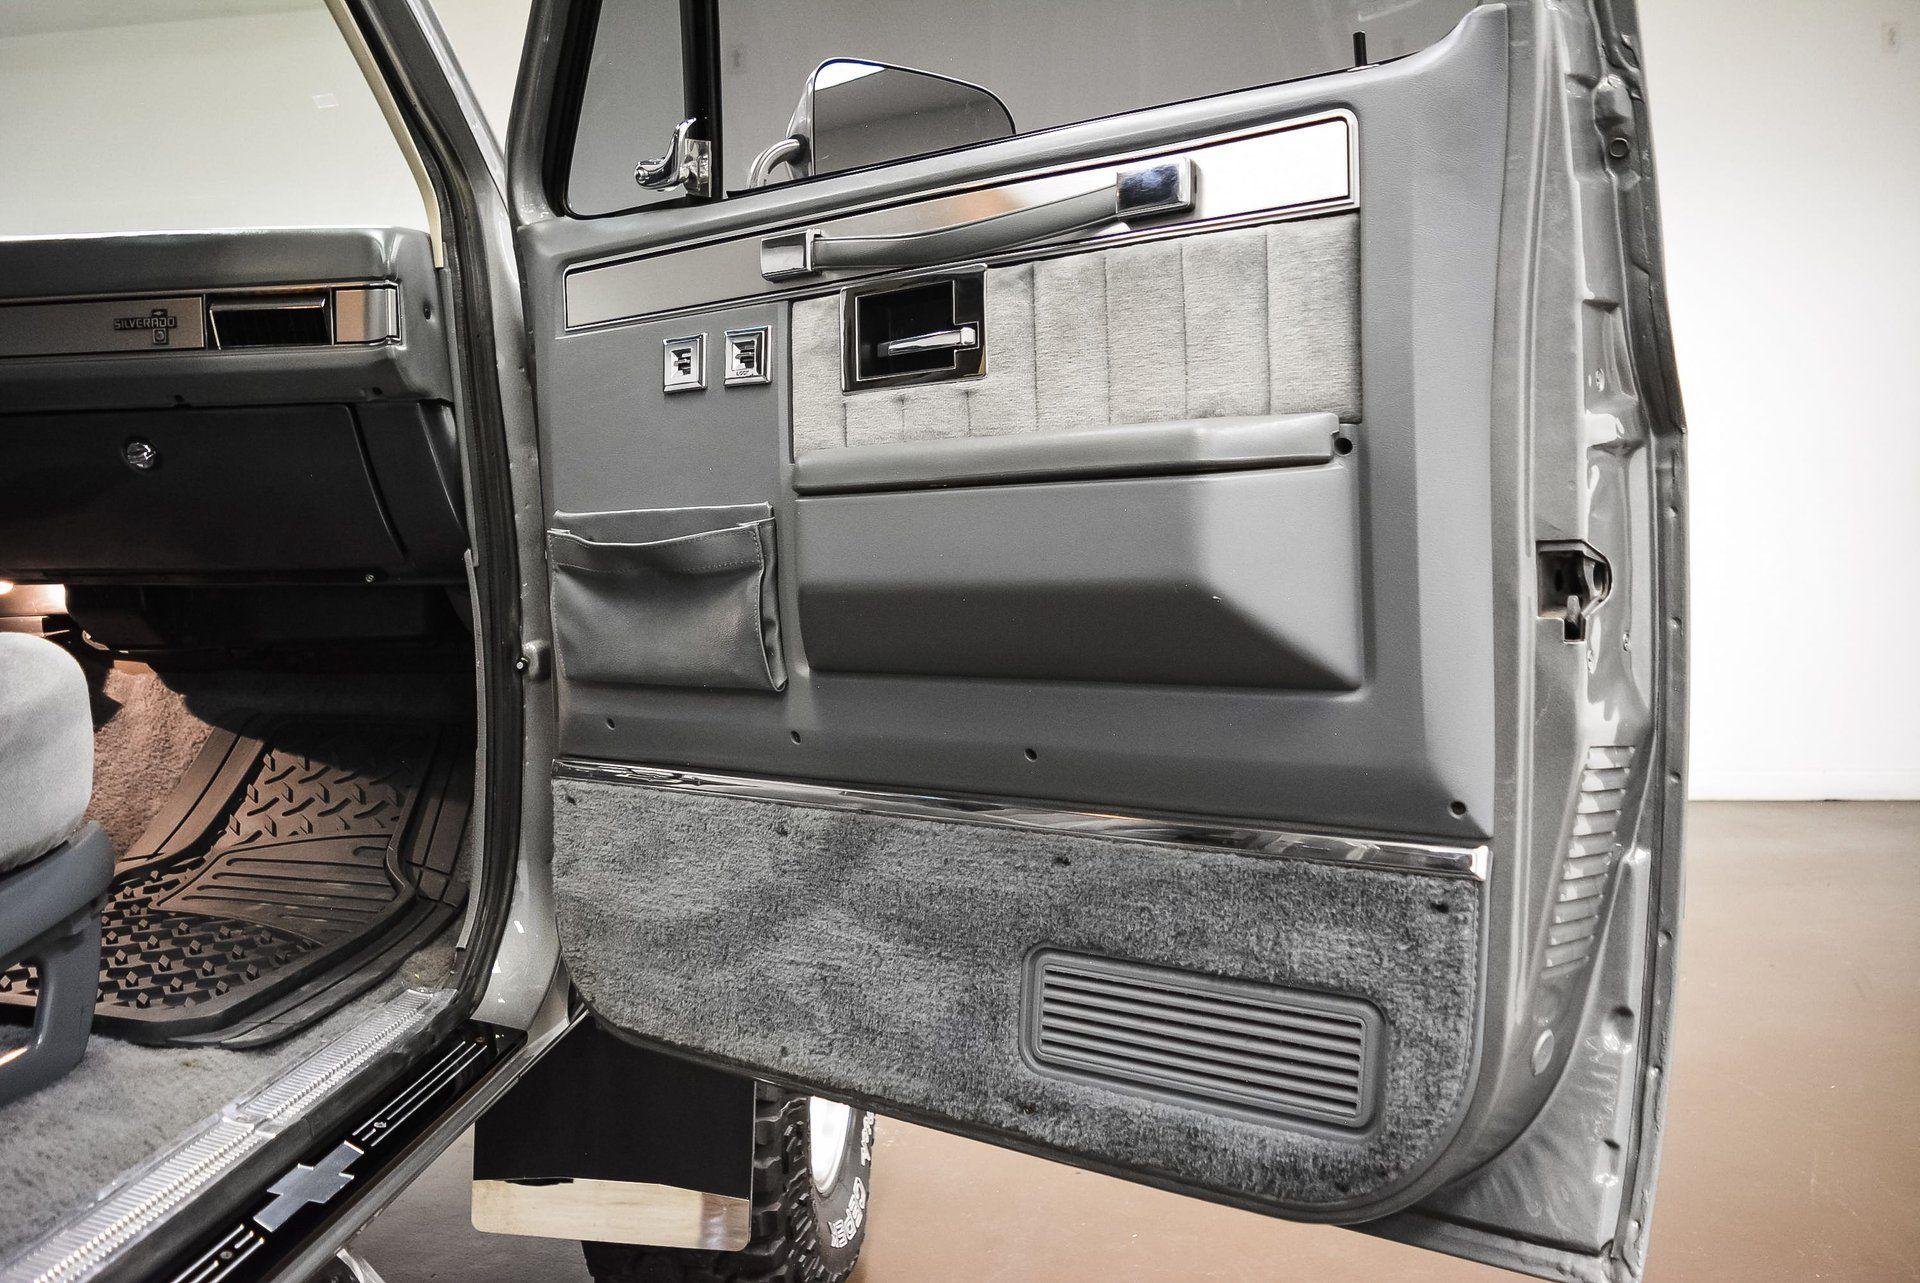 1987 Chevrolet K 5 Blazer Classic Car Liquidators In Sherman Tx In 2020 Chevy Blazer K5 Chevrolet Lifted Chevy Trucks